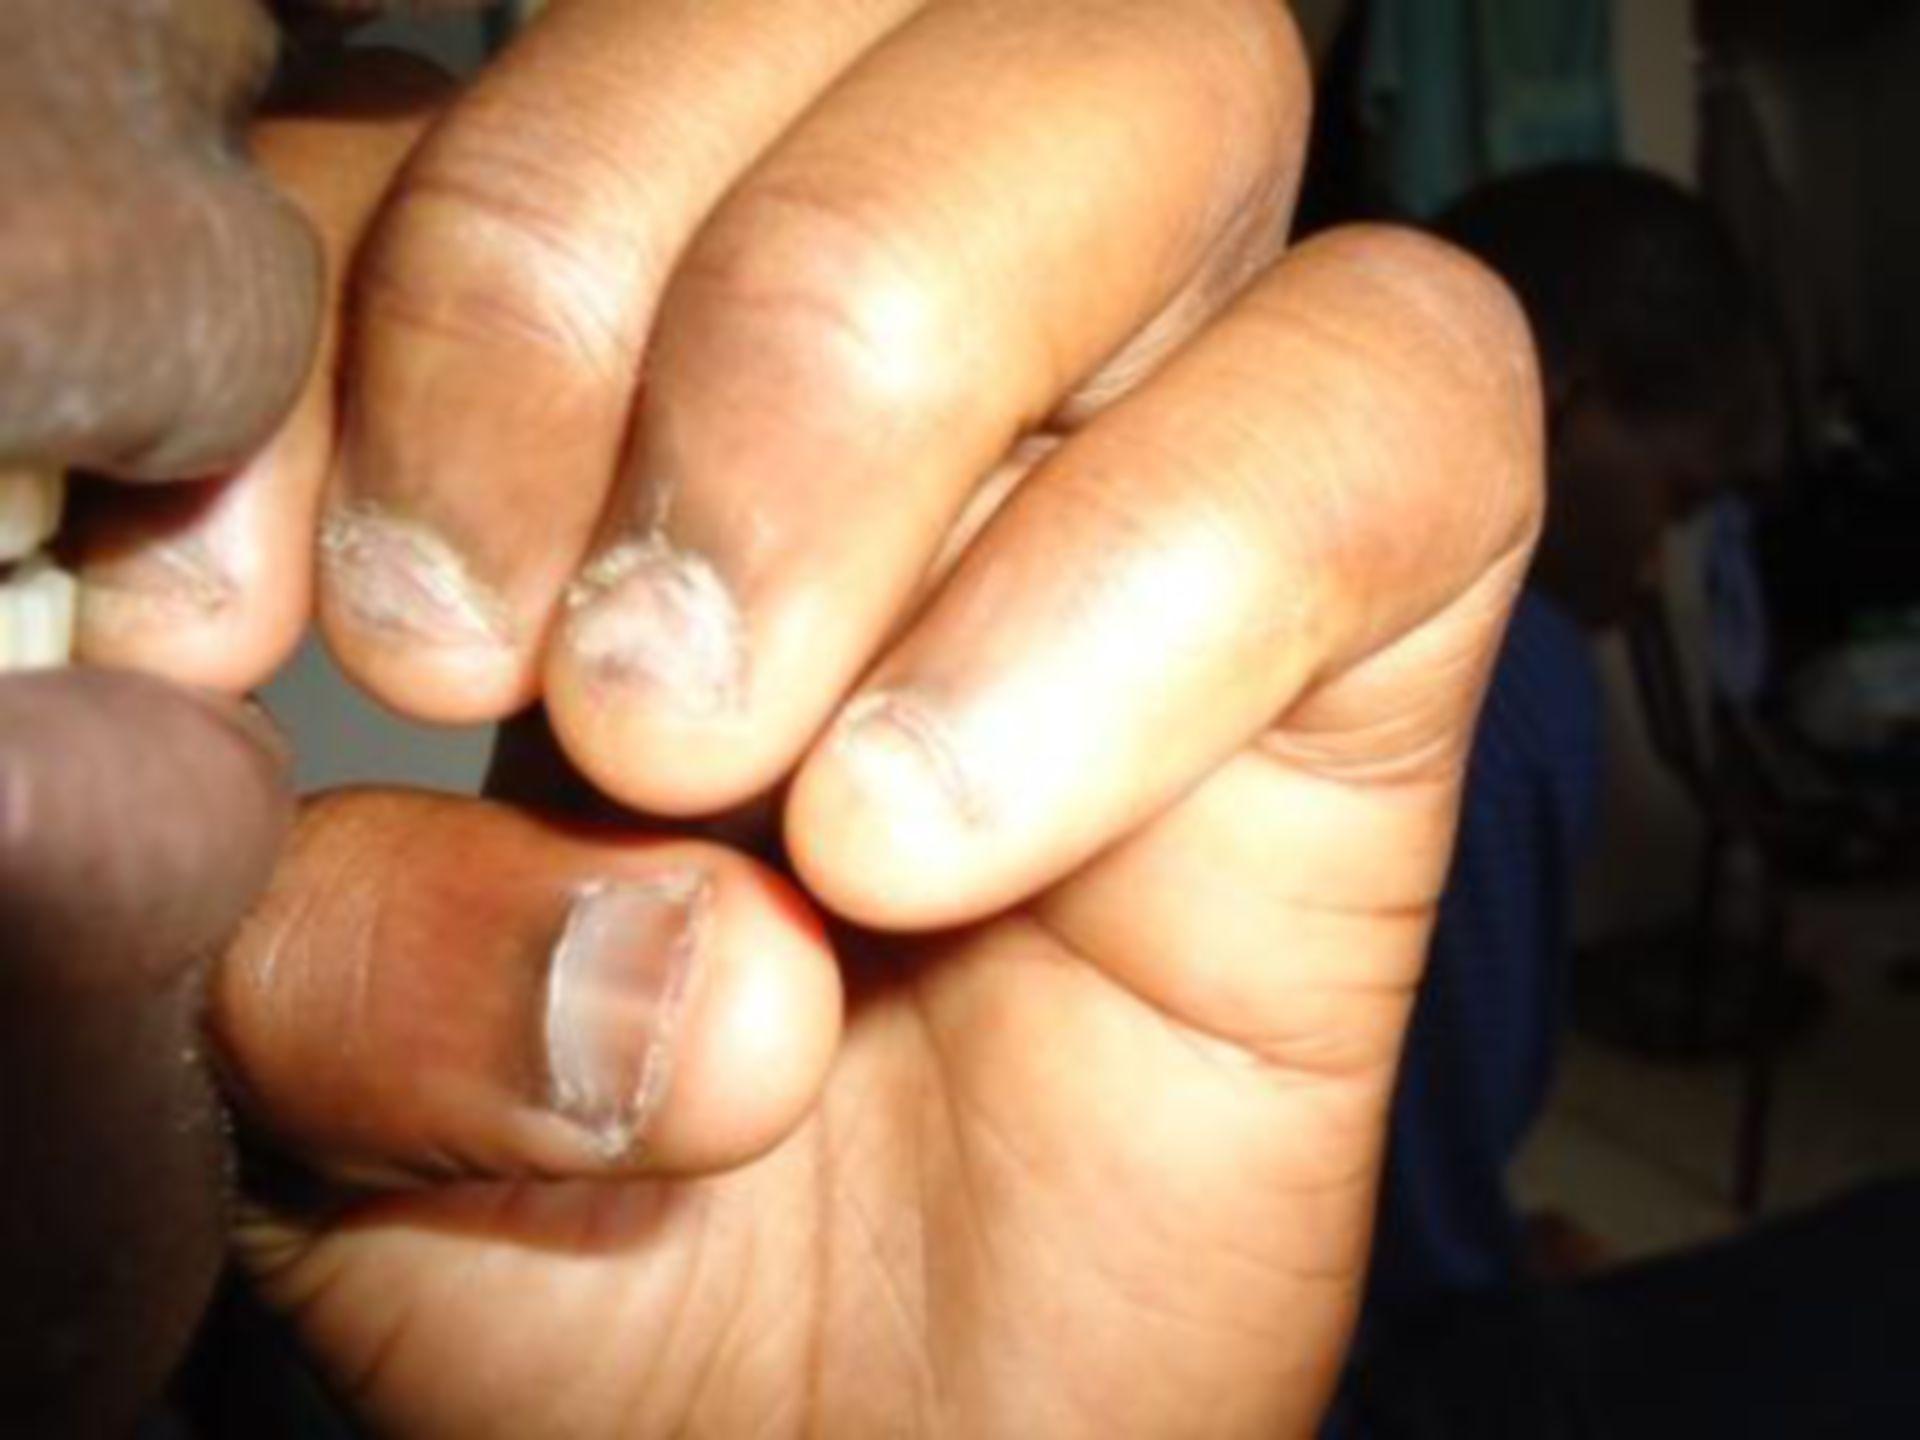 Onychophagie: addiction à ronger les ongles